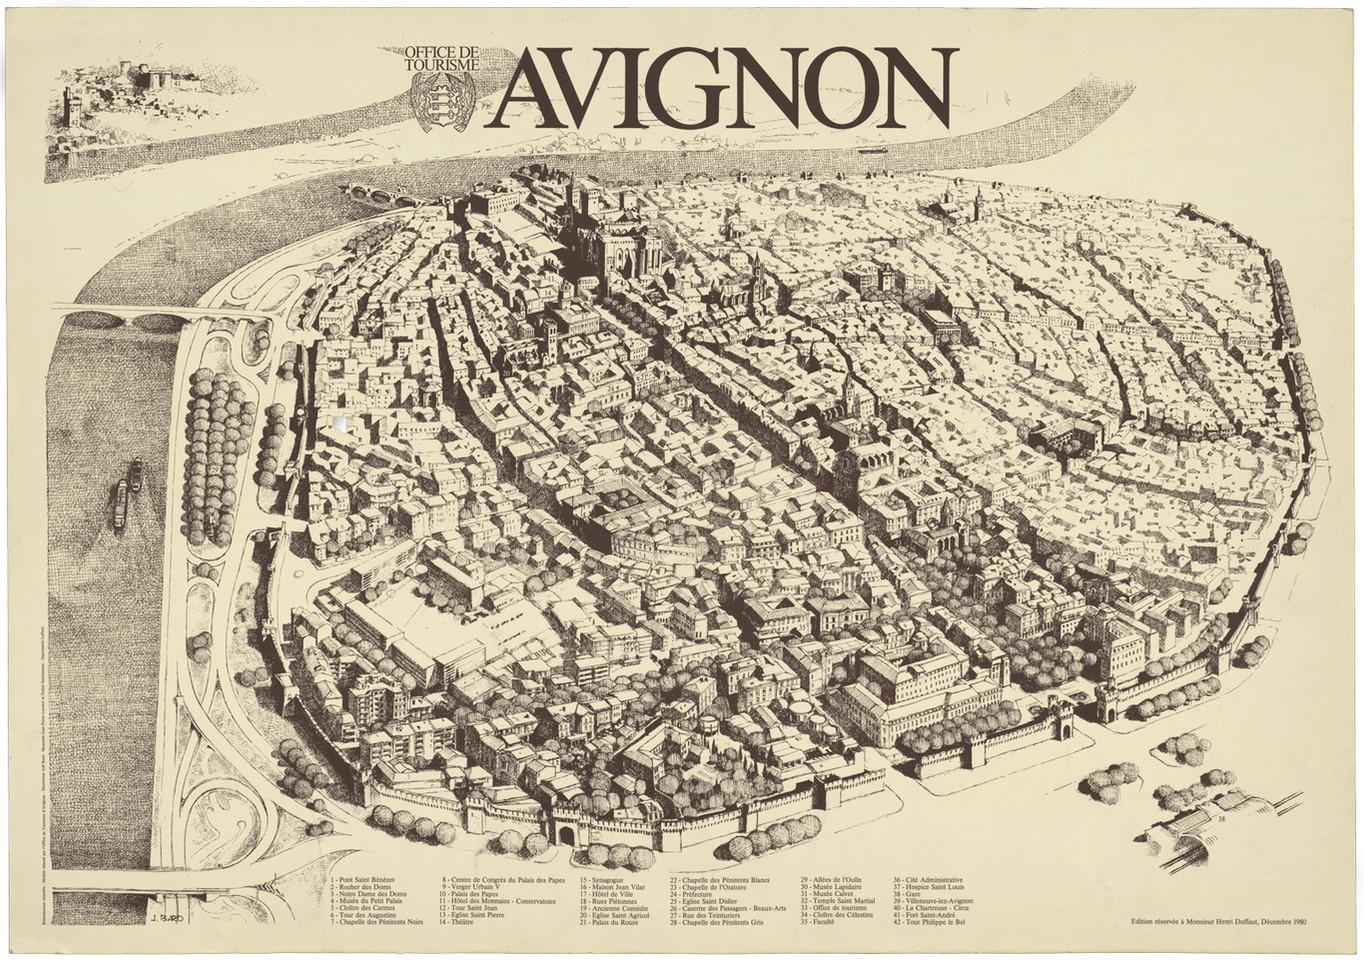 1980 – Avignon en perspective cavalière. Dessin de J. Bard